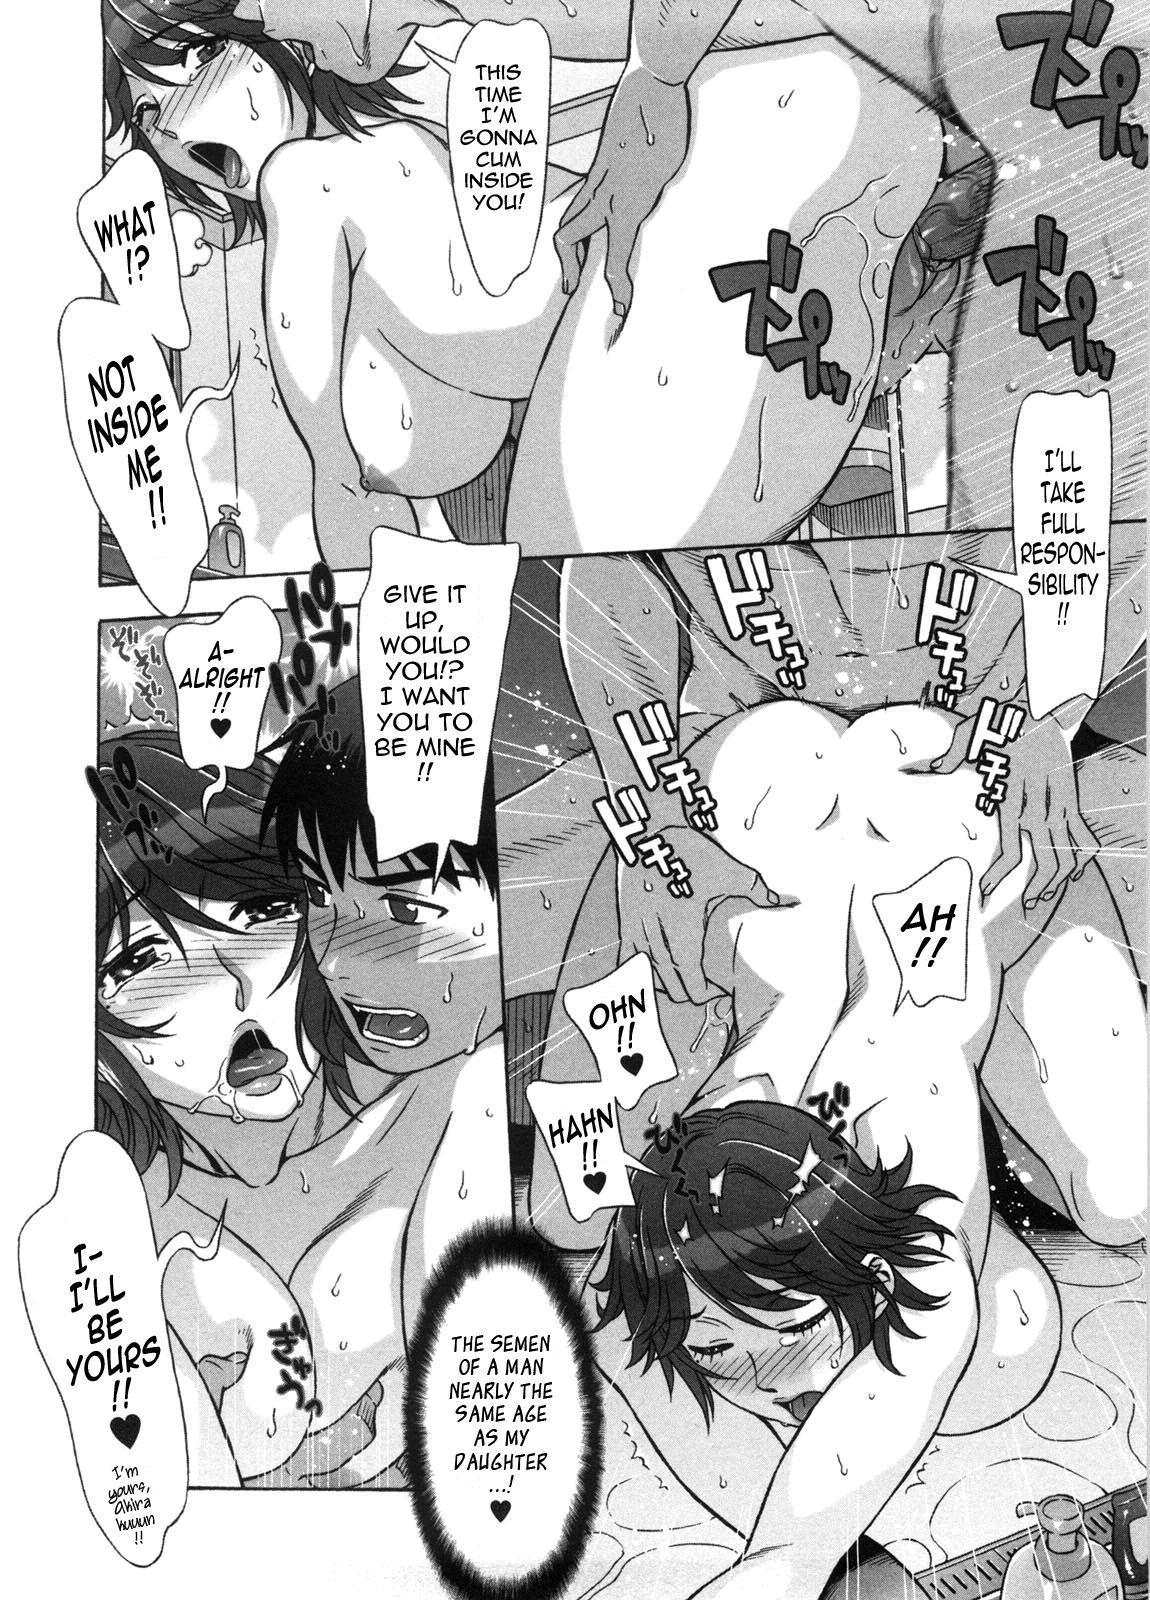 [Hanzaki Jirou] Ama Ero - Sweet Sugar Baby Ch. 1-7 [English] [Tadanohito] [Decensored] 64